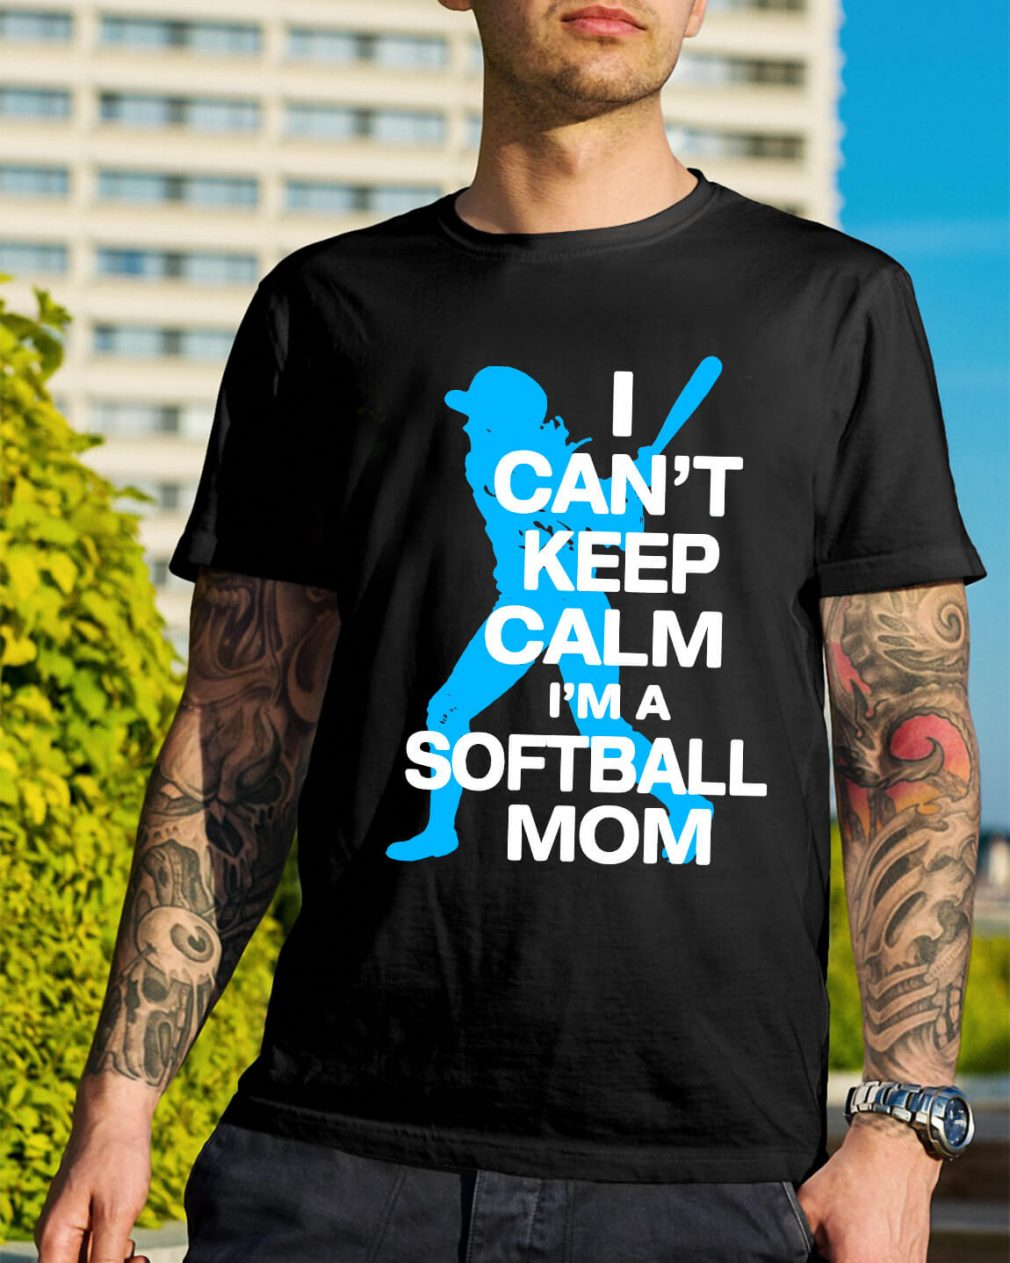 I can't keep calm I'm a softball mom shirt